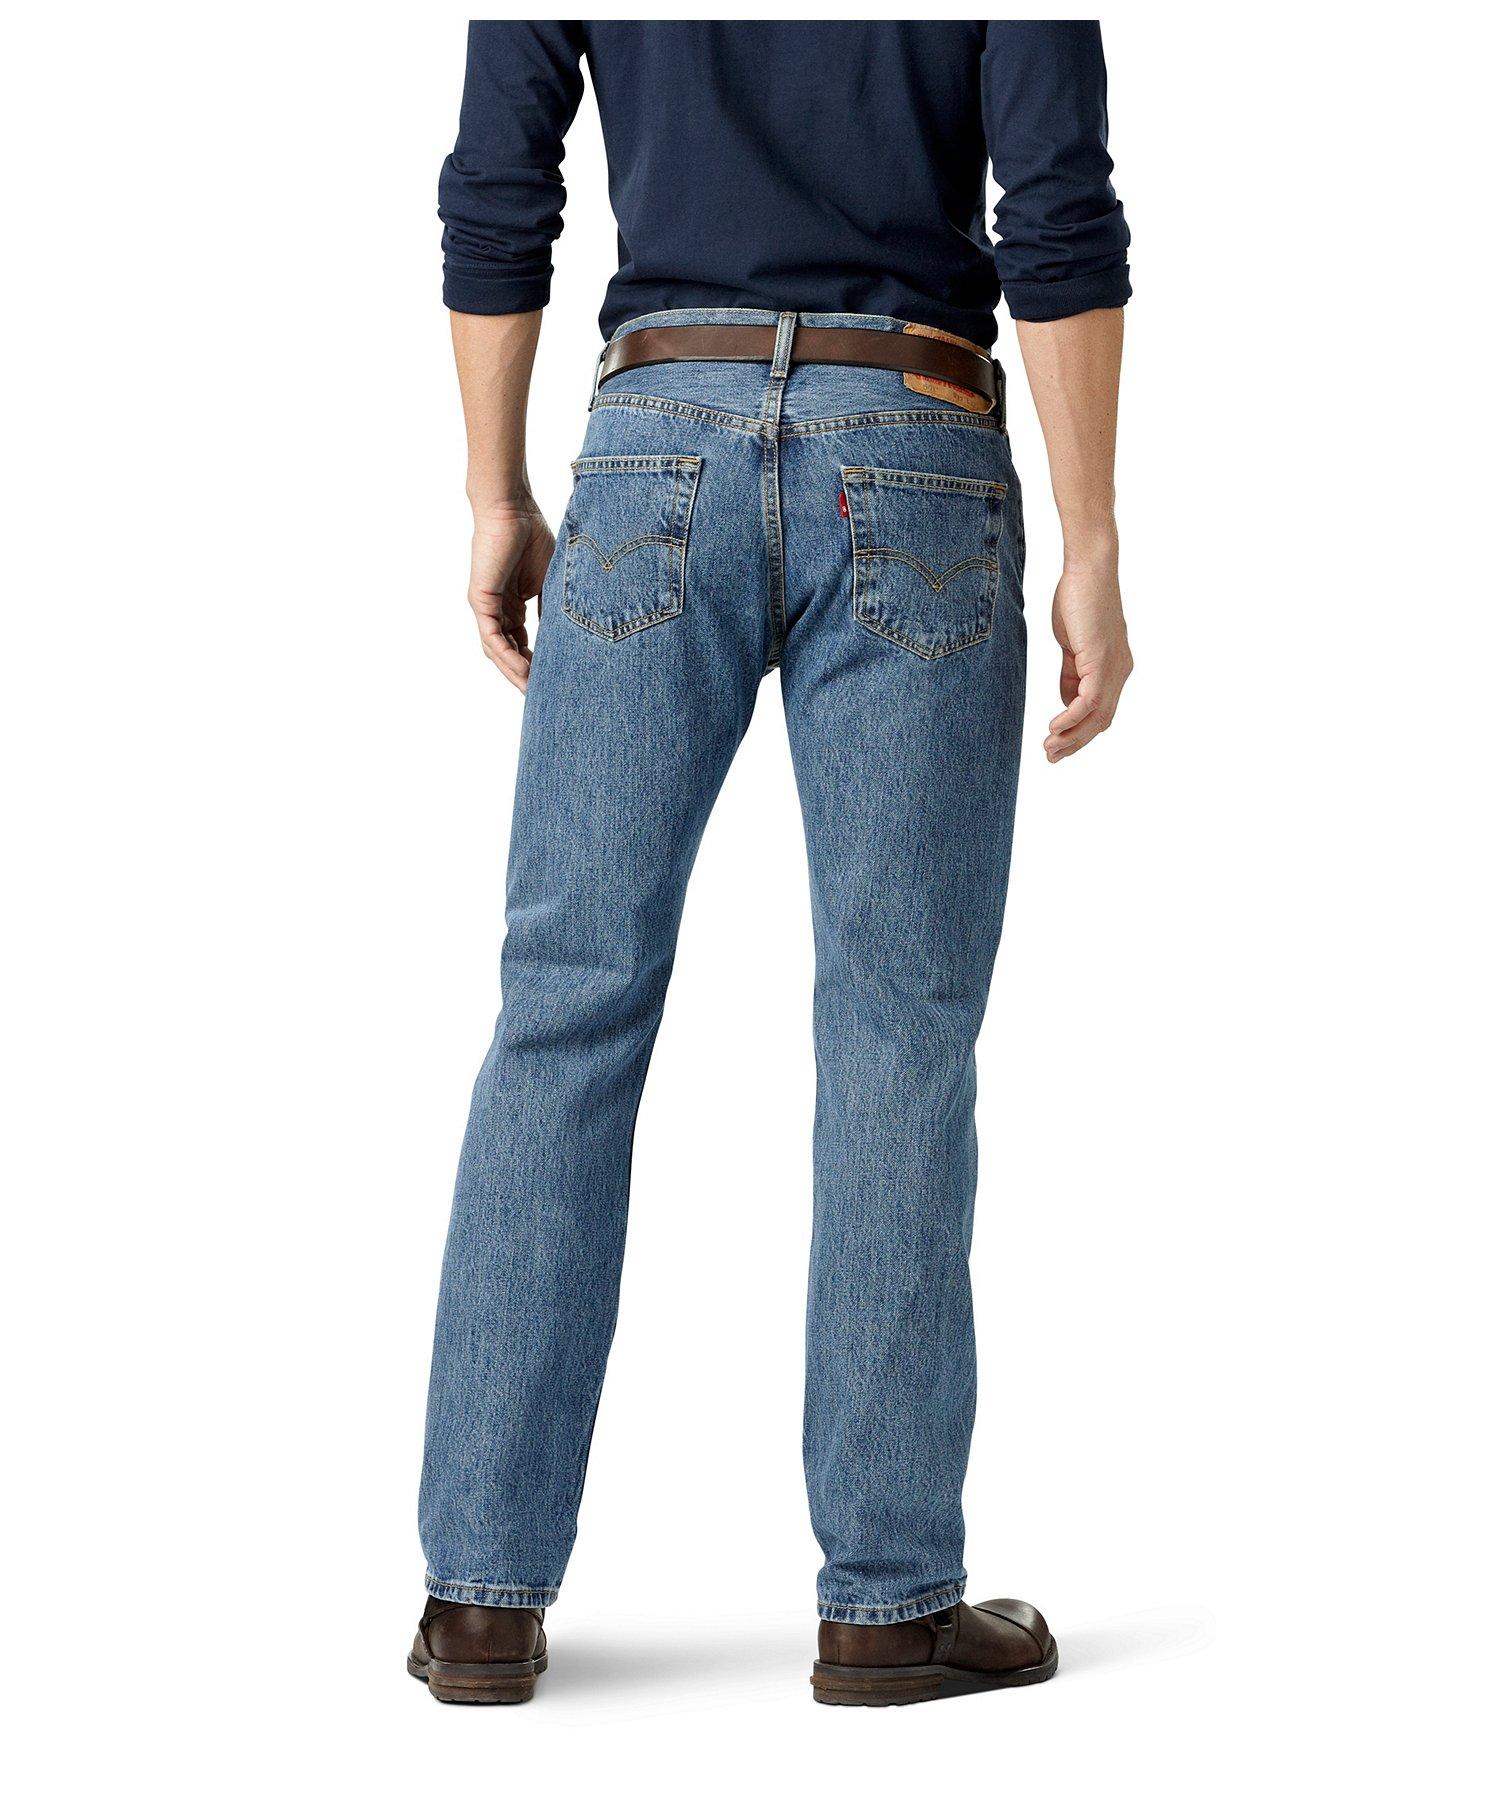 daño Chispa  chispear Reunión  Men's 501® Original Fit - Stonewash Jeans   Mark's